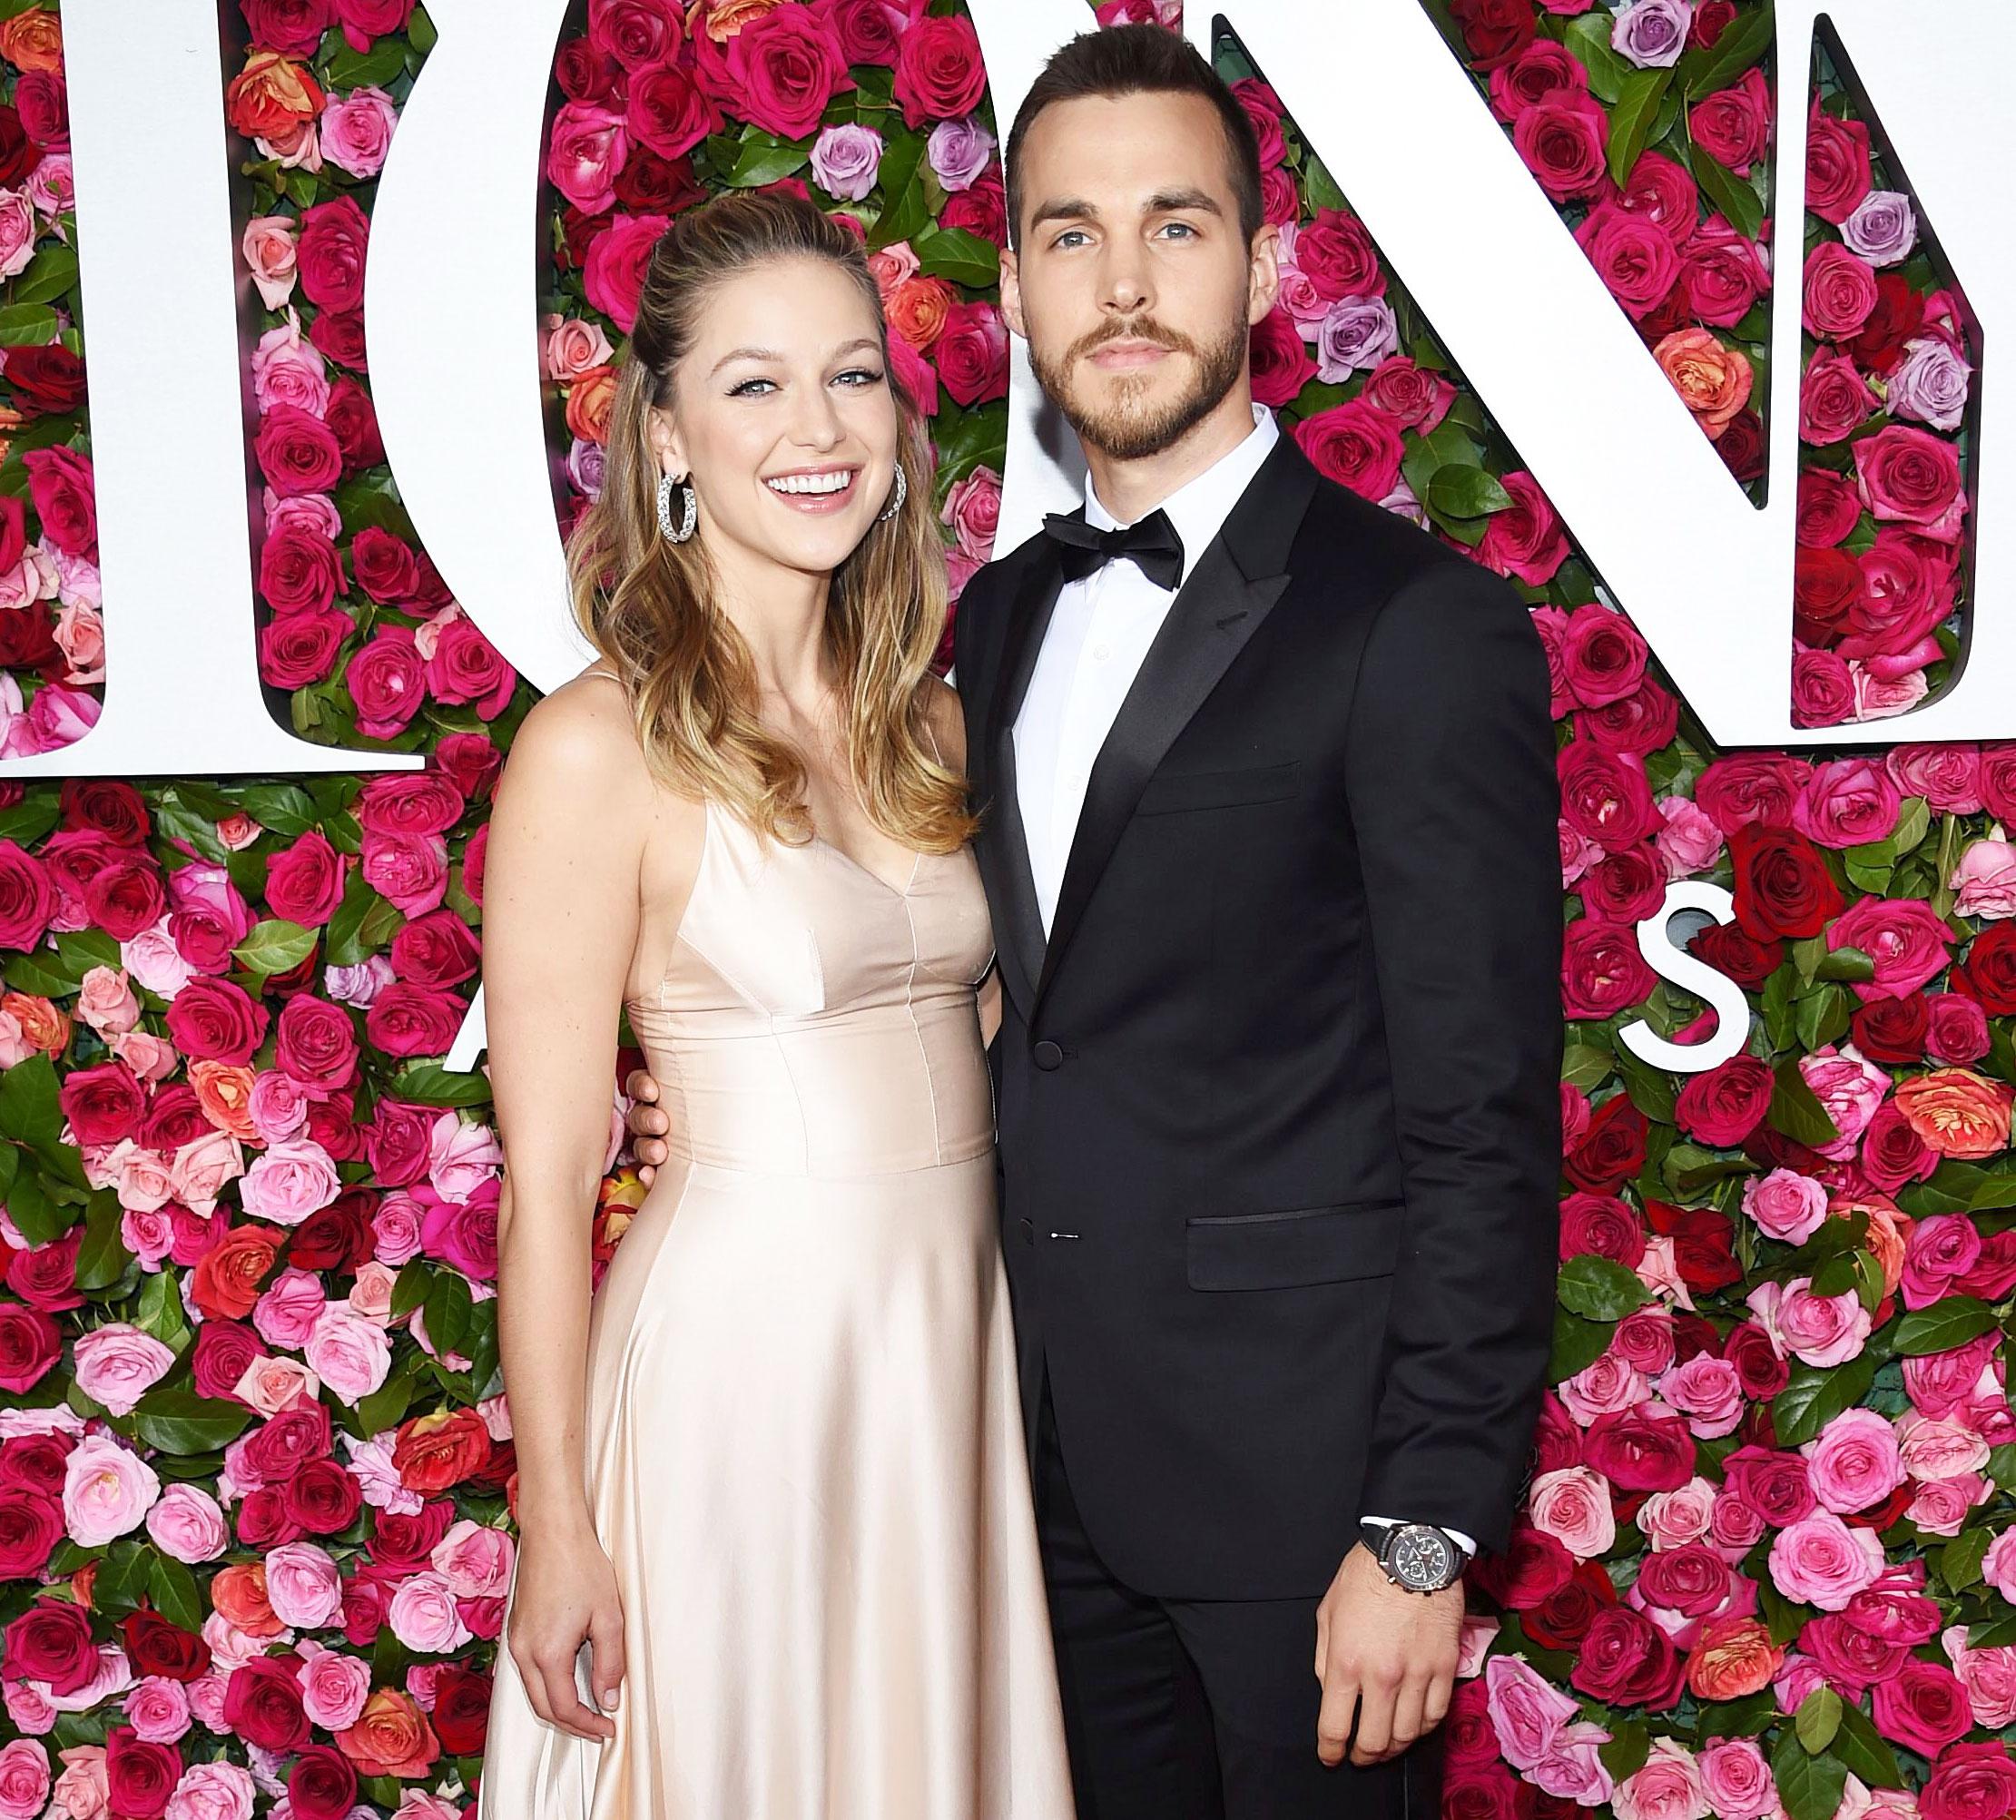 Supergirl' Costars Melissa Benoist and Chris Wood Marry